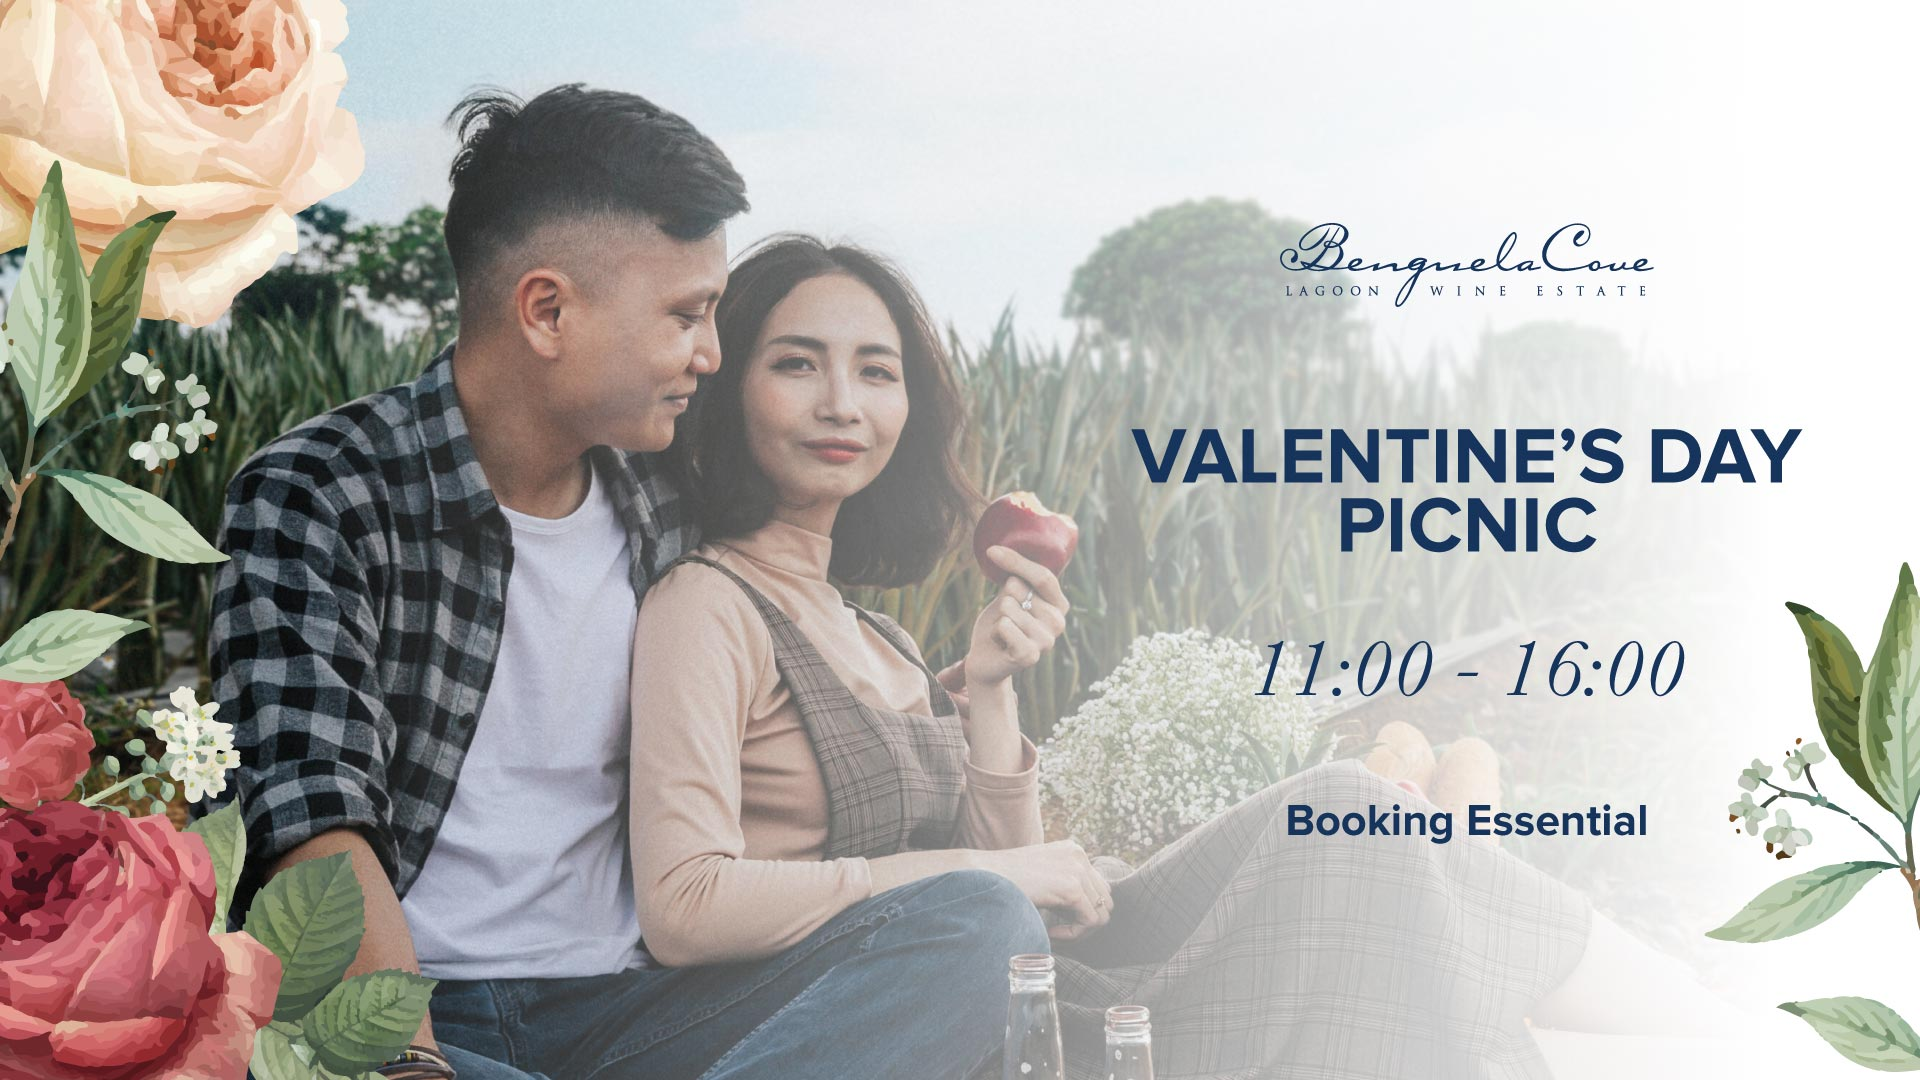 Valentine's Day Picnic at Benguela Cove photo